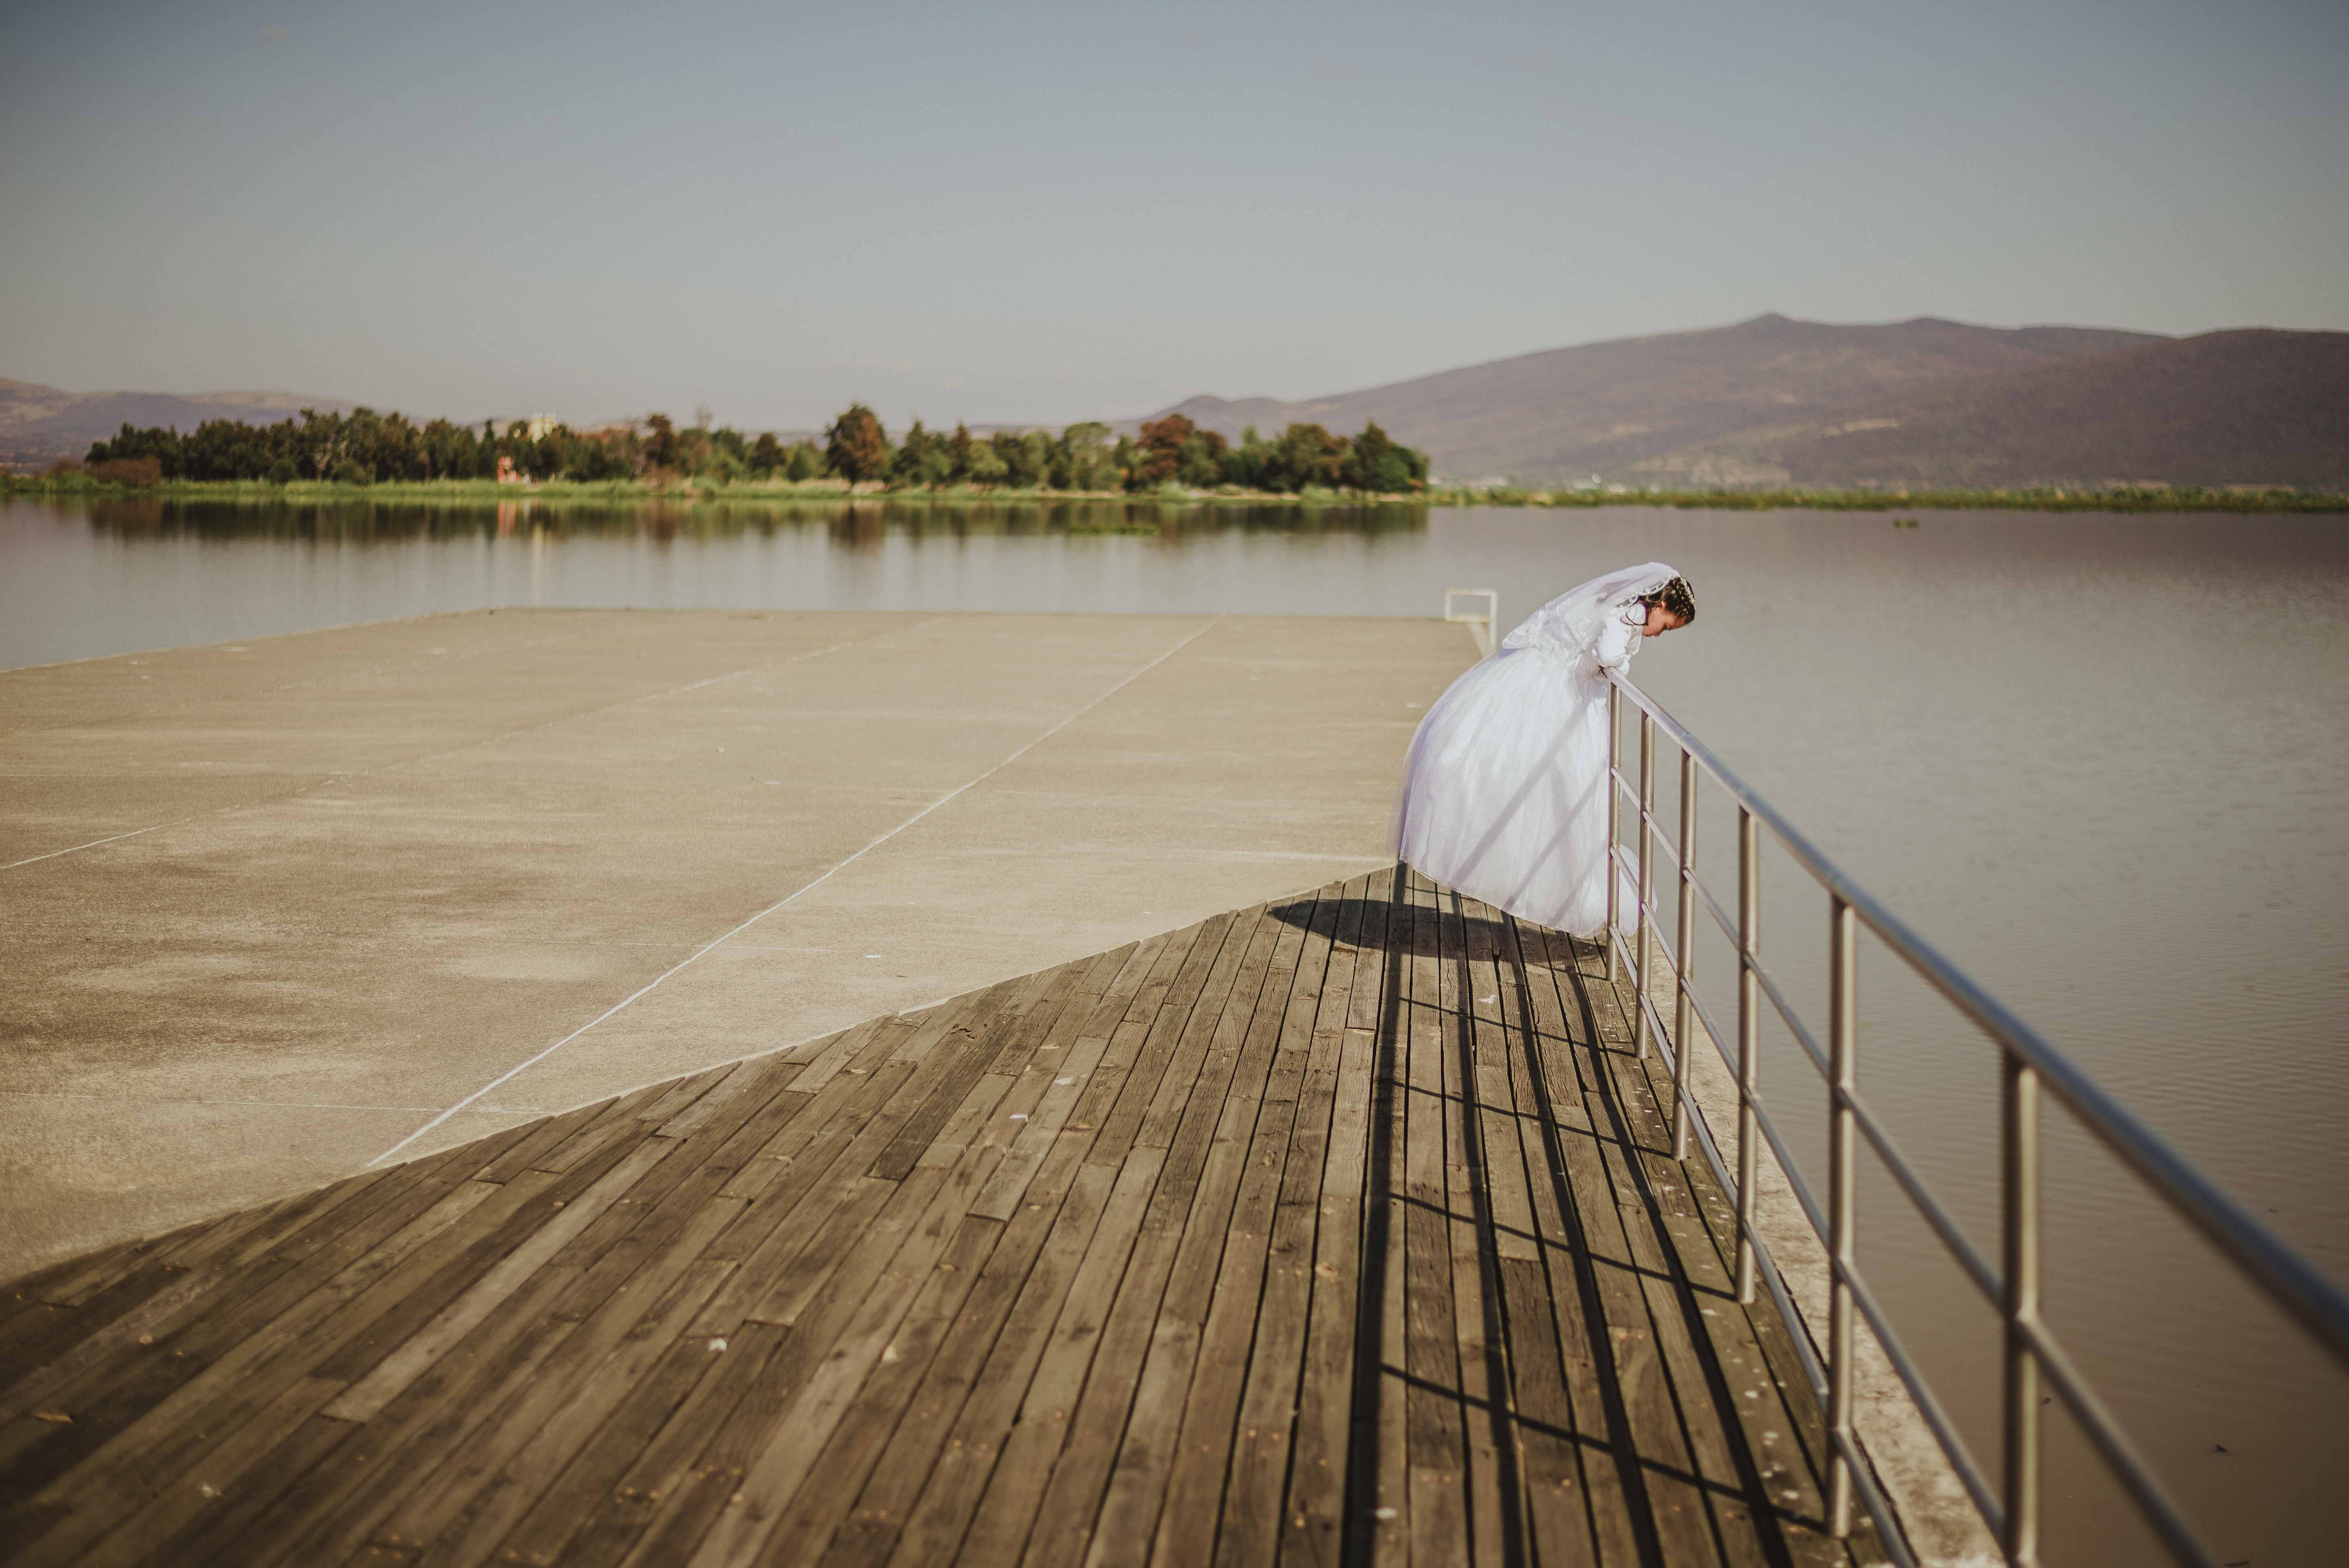 woman wearing wedding dress looking on body of water